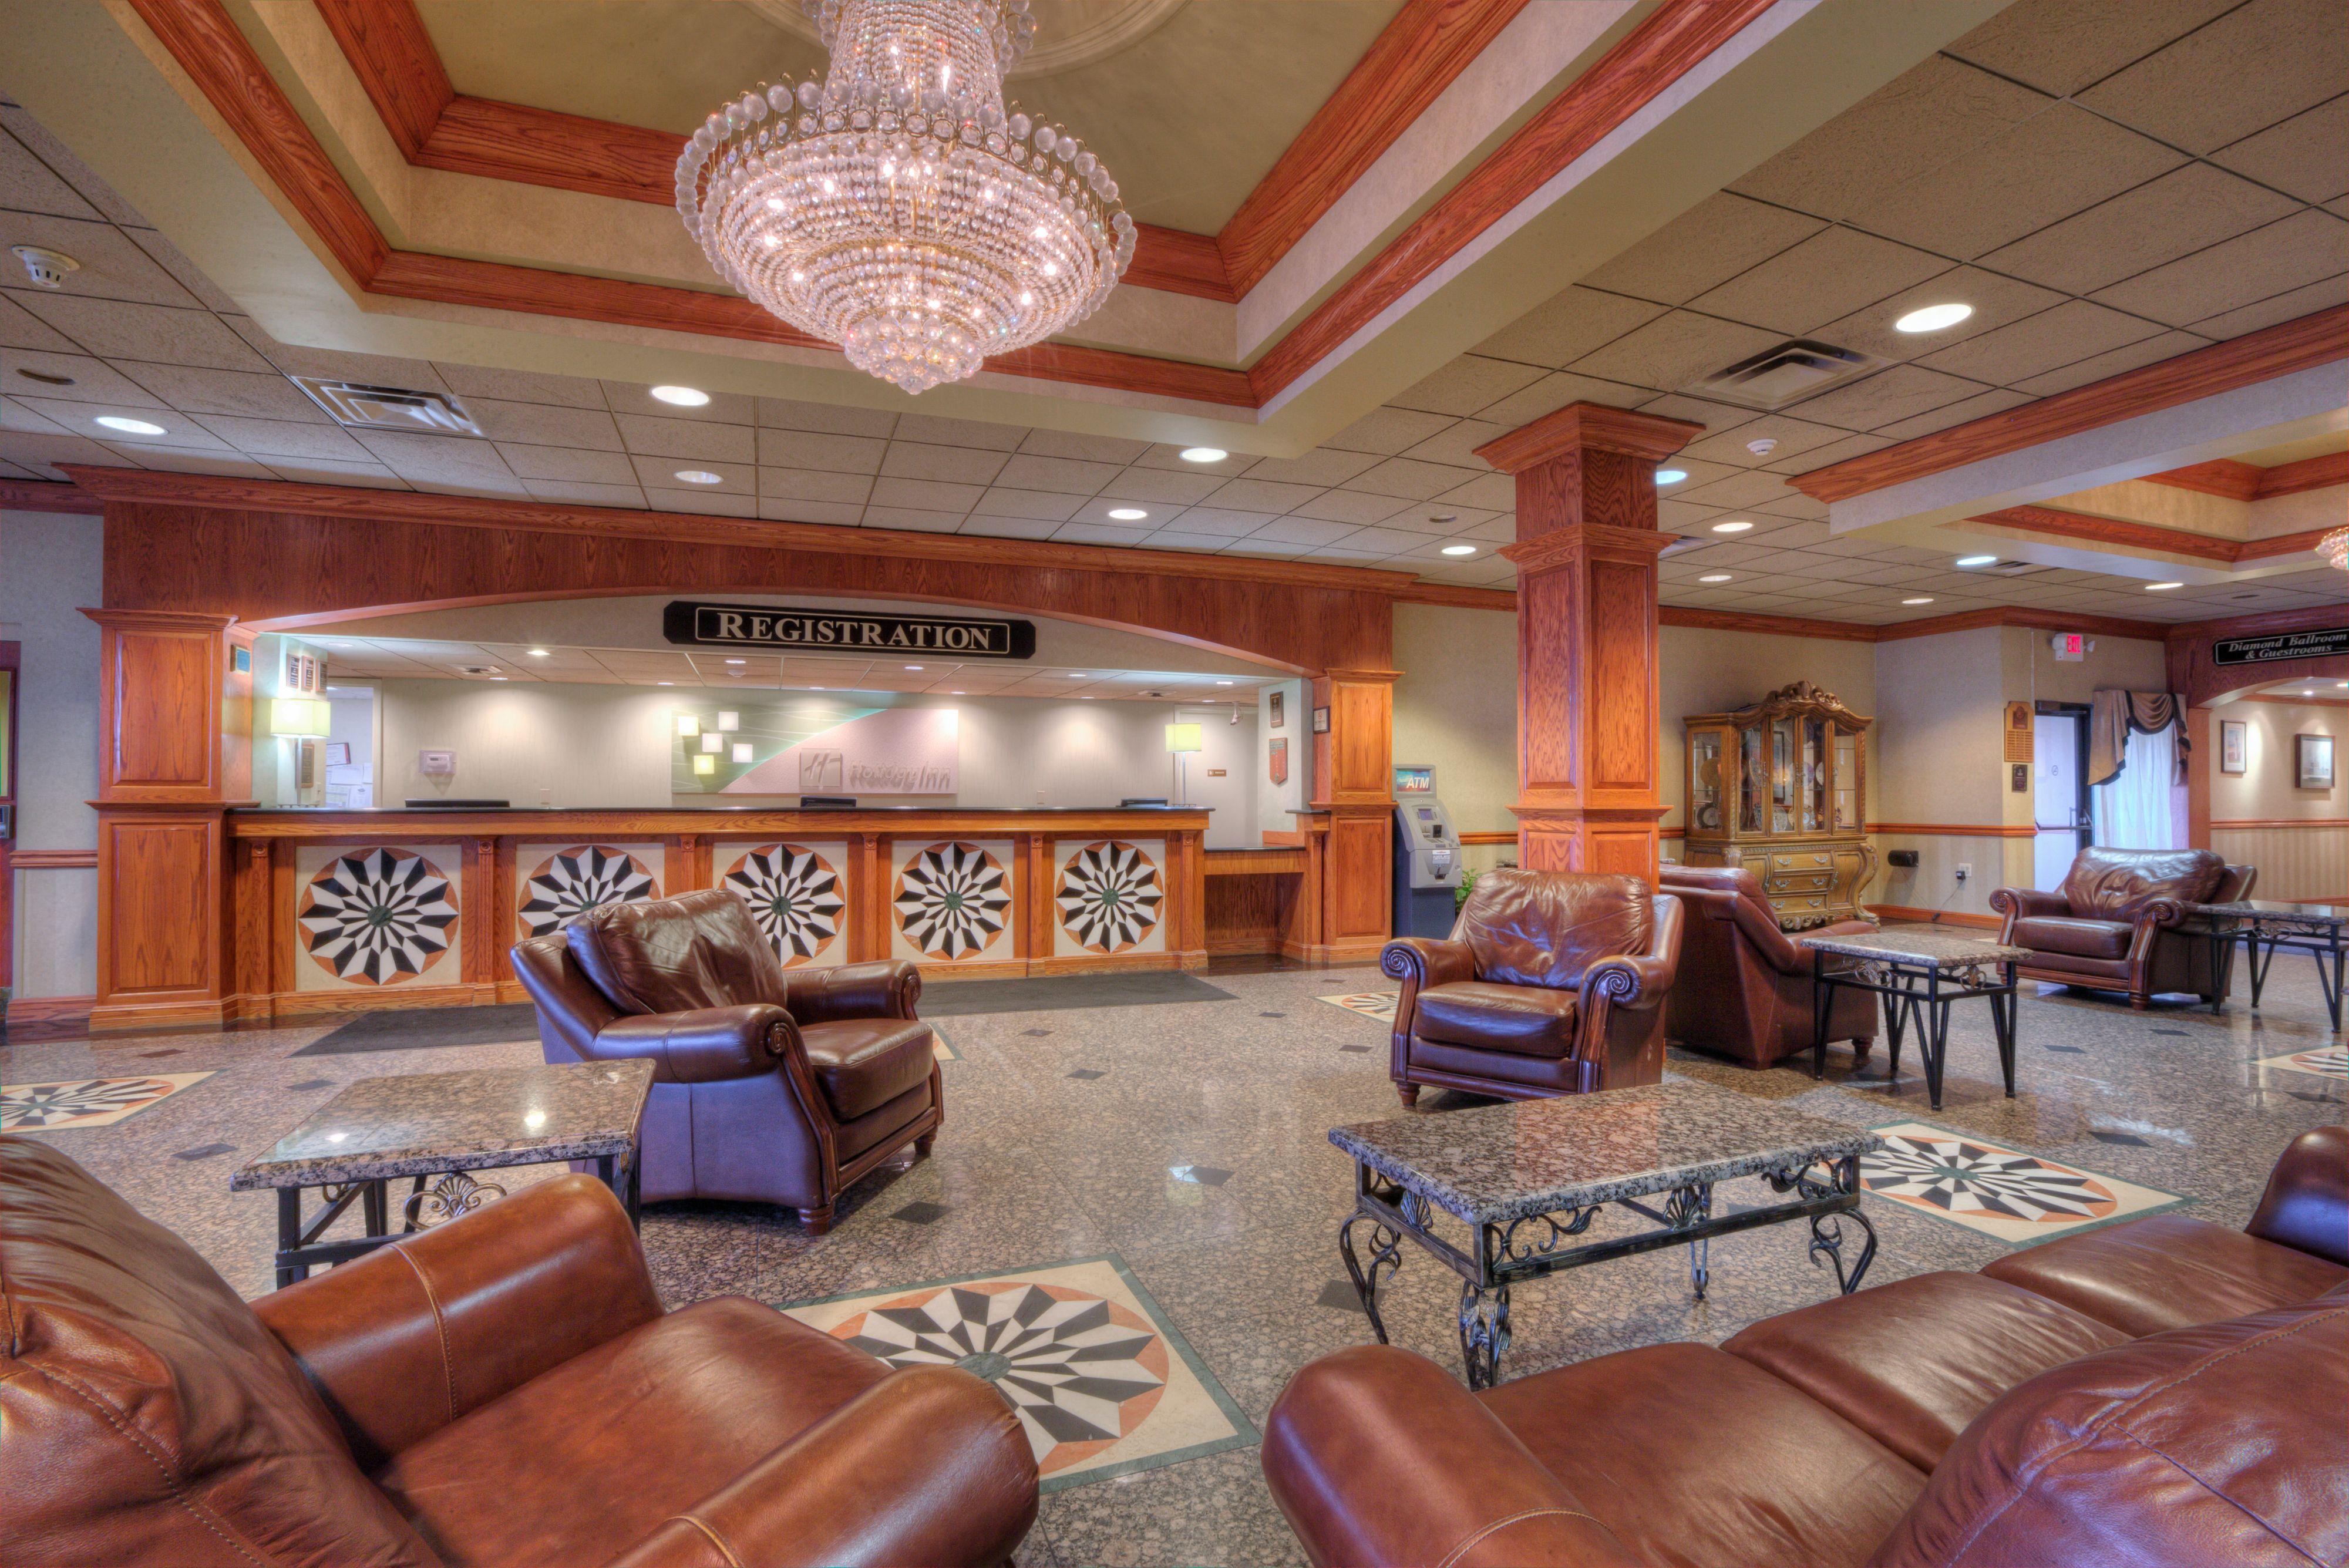 Holiday Inn Southgate (Detroit-South) image 4